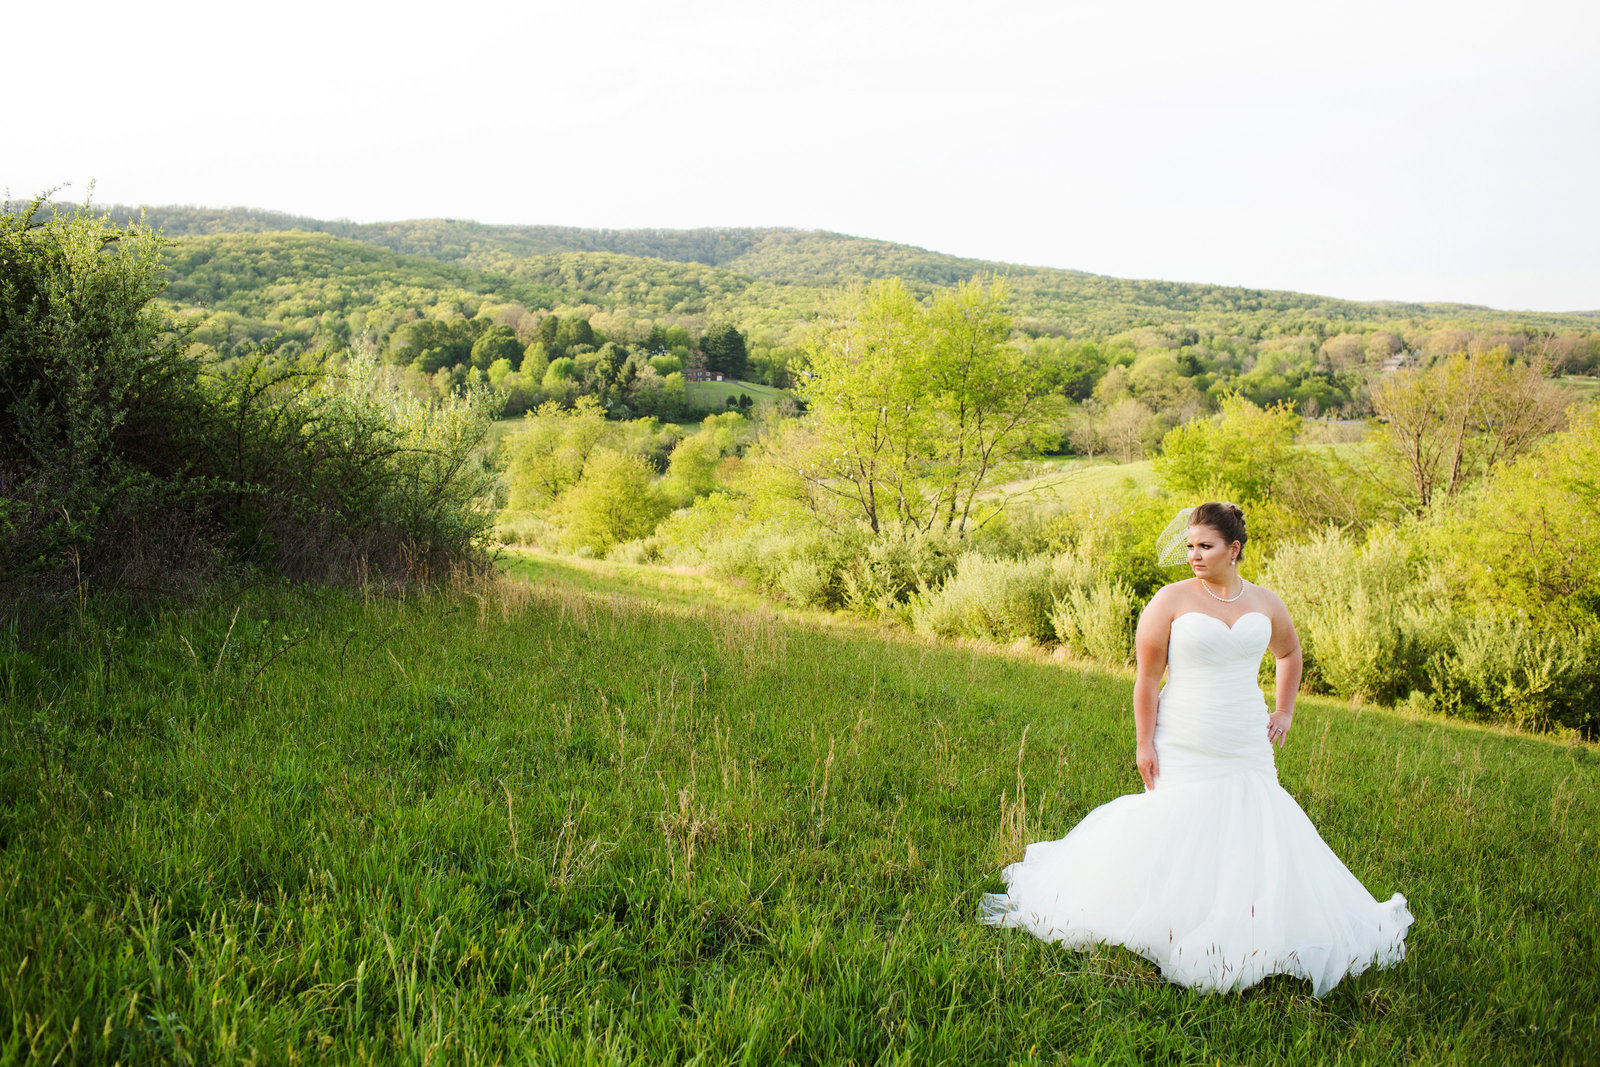 bridal portrait skyryder engagement wedding photography blacksburg roanoke charlottesville lexington radford-007